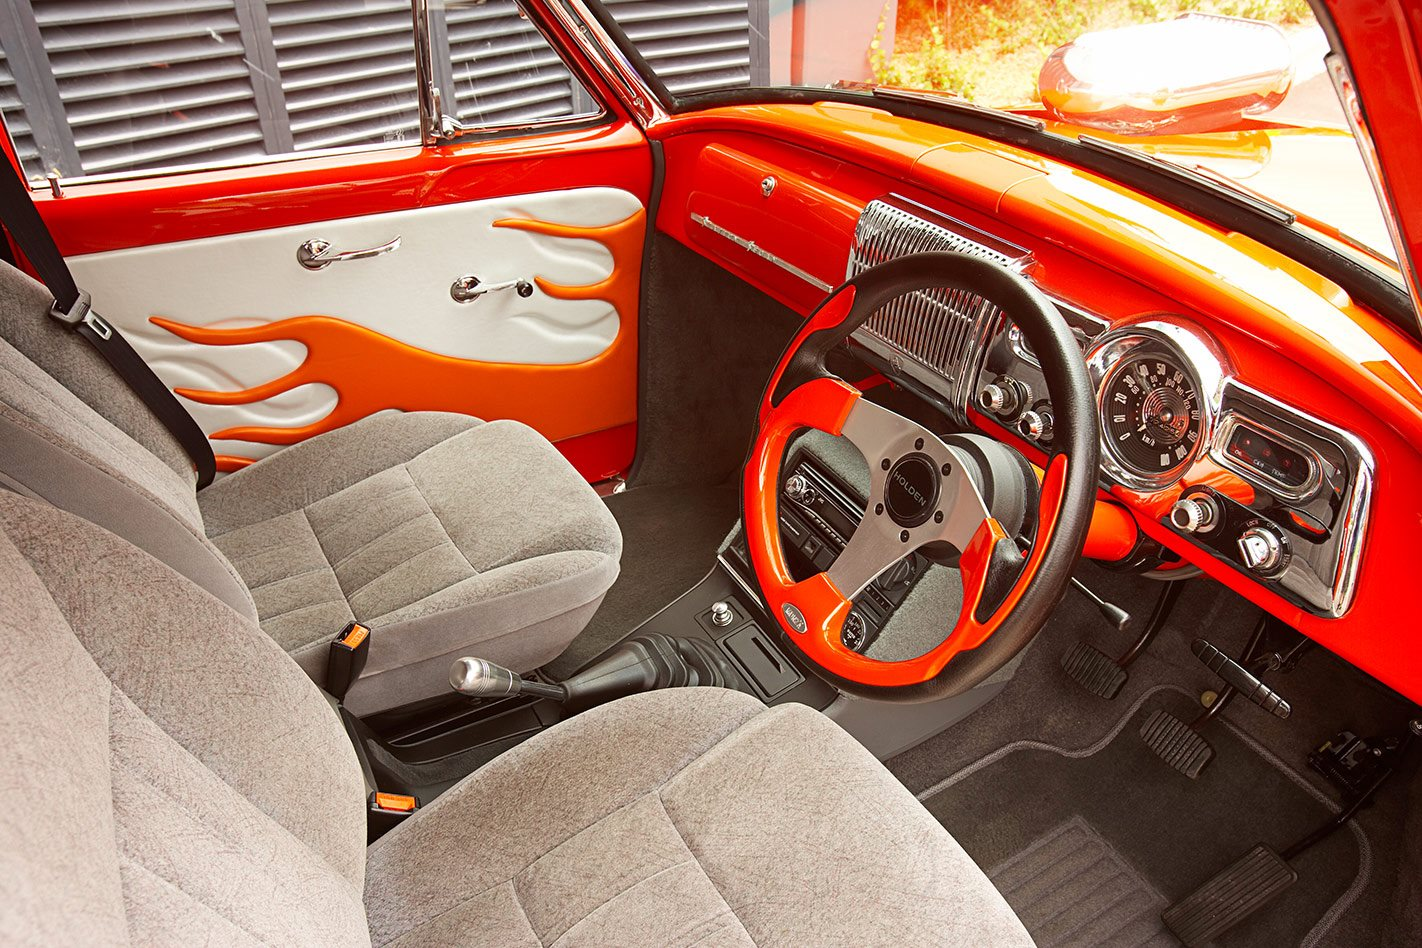 Holden FC wagon interior front